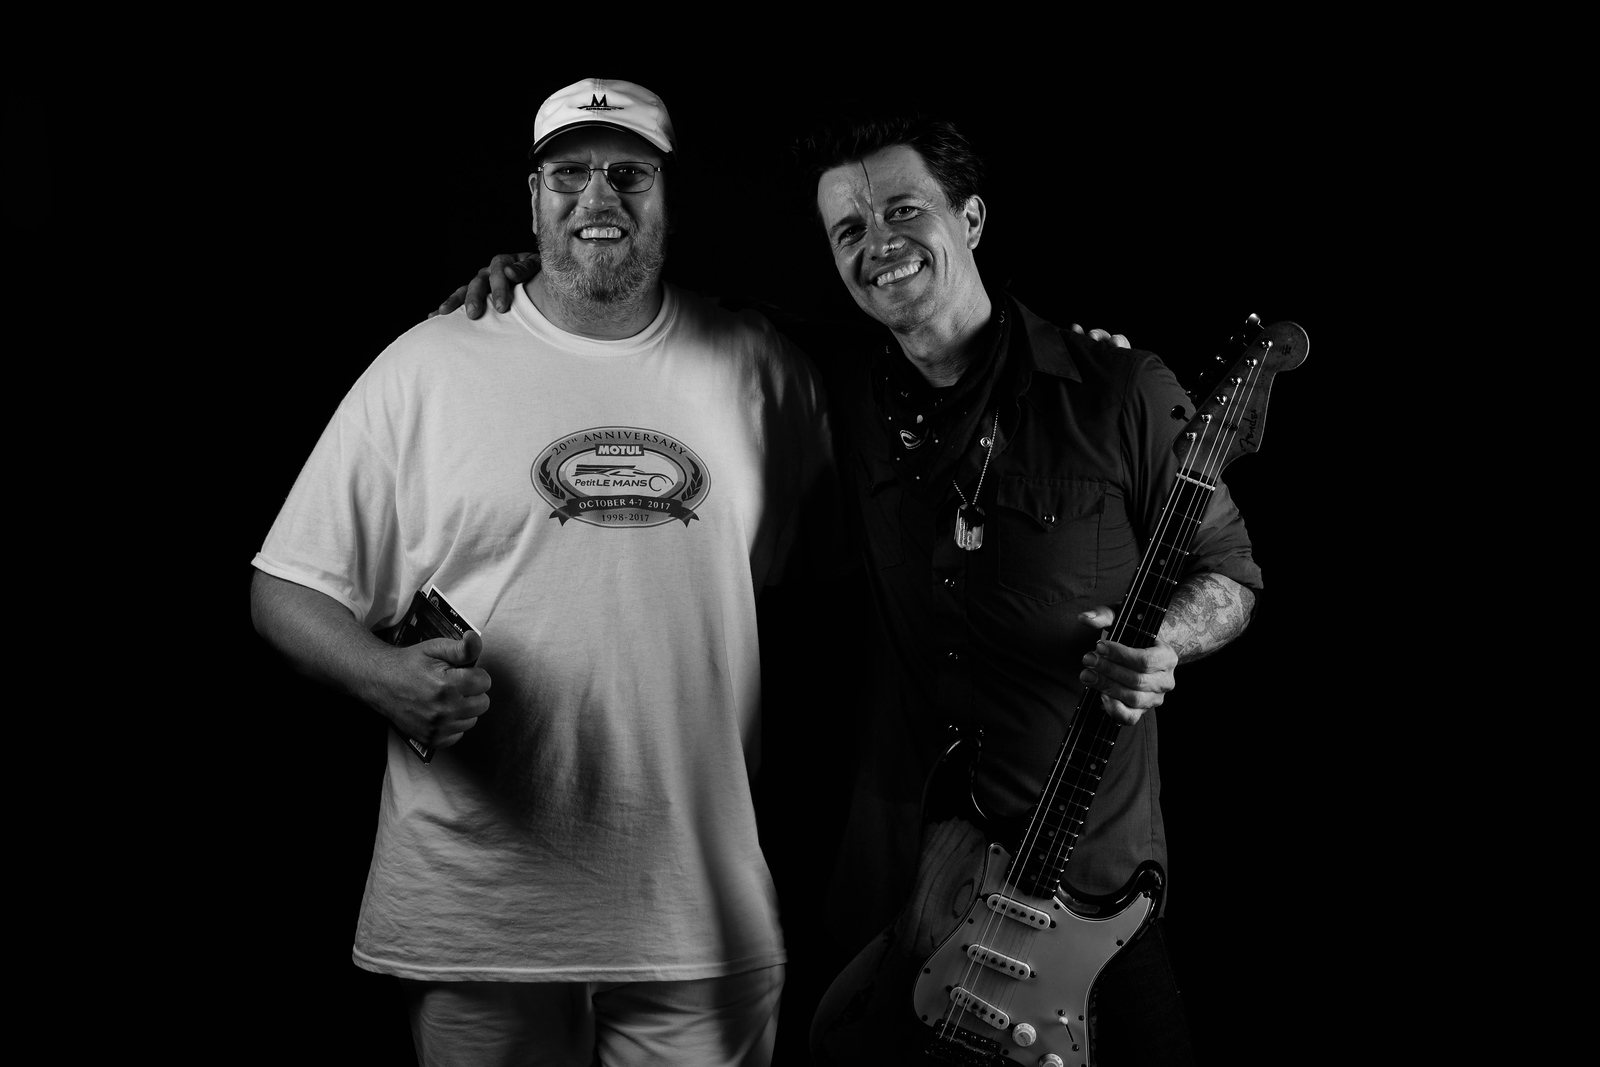 Brent McNaul and Eric Tessmer